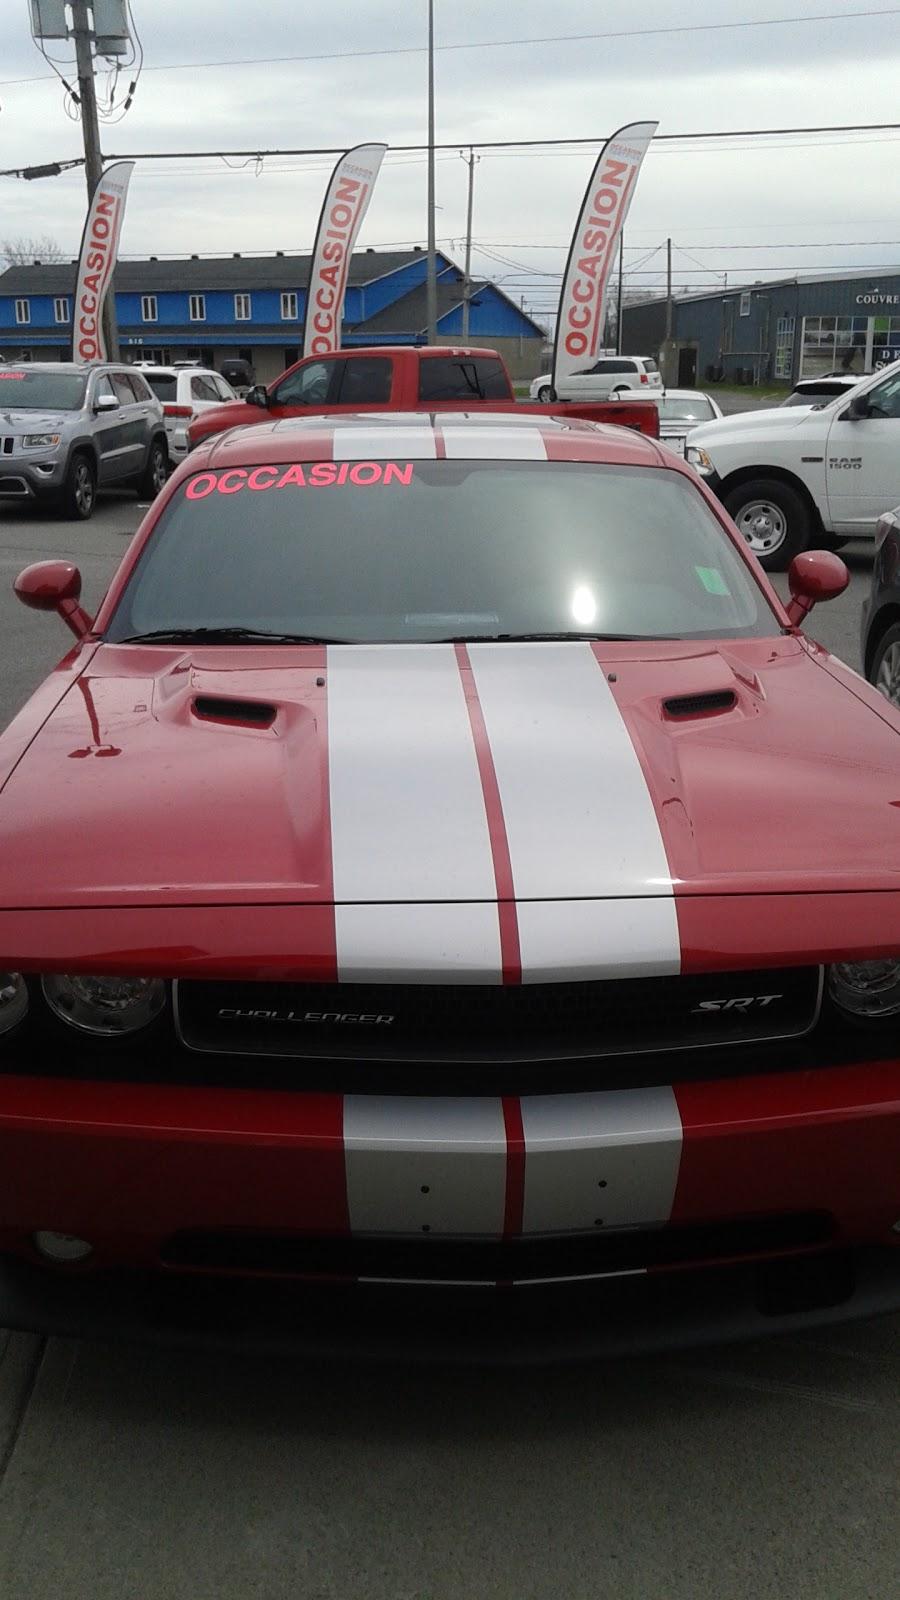 Duclos Valleyfield Chrysler Dodge Jeep RAM INC. | car dealer | 595 Boulevard Monseigneur-Langlois, Salaberry-de-Valleyfield, QC J6S 0B1, Canada | 4503715103 OR +1 450-371-5103